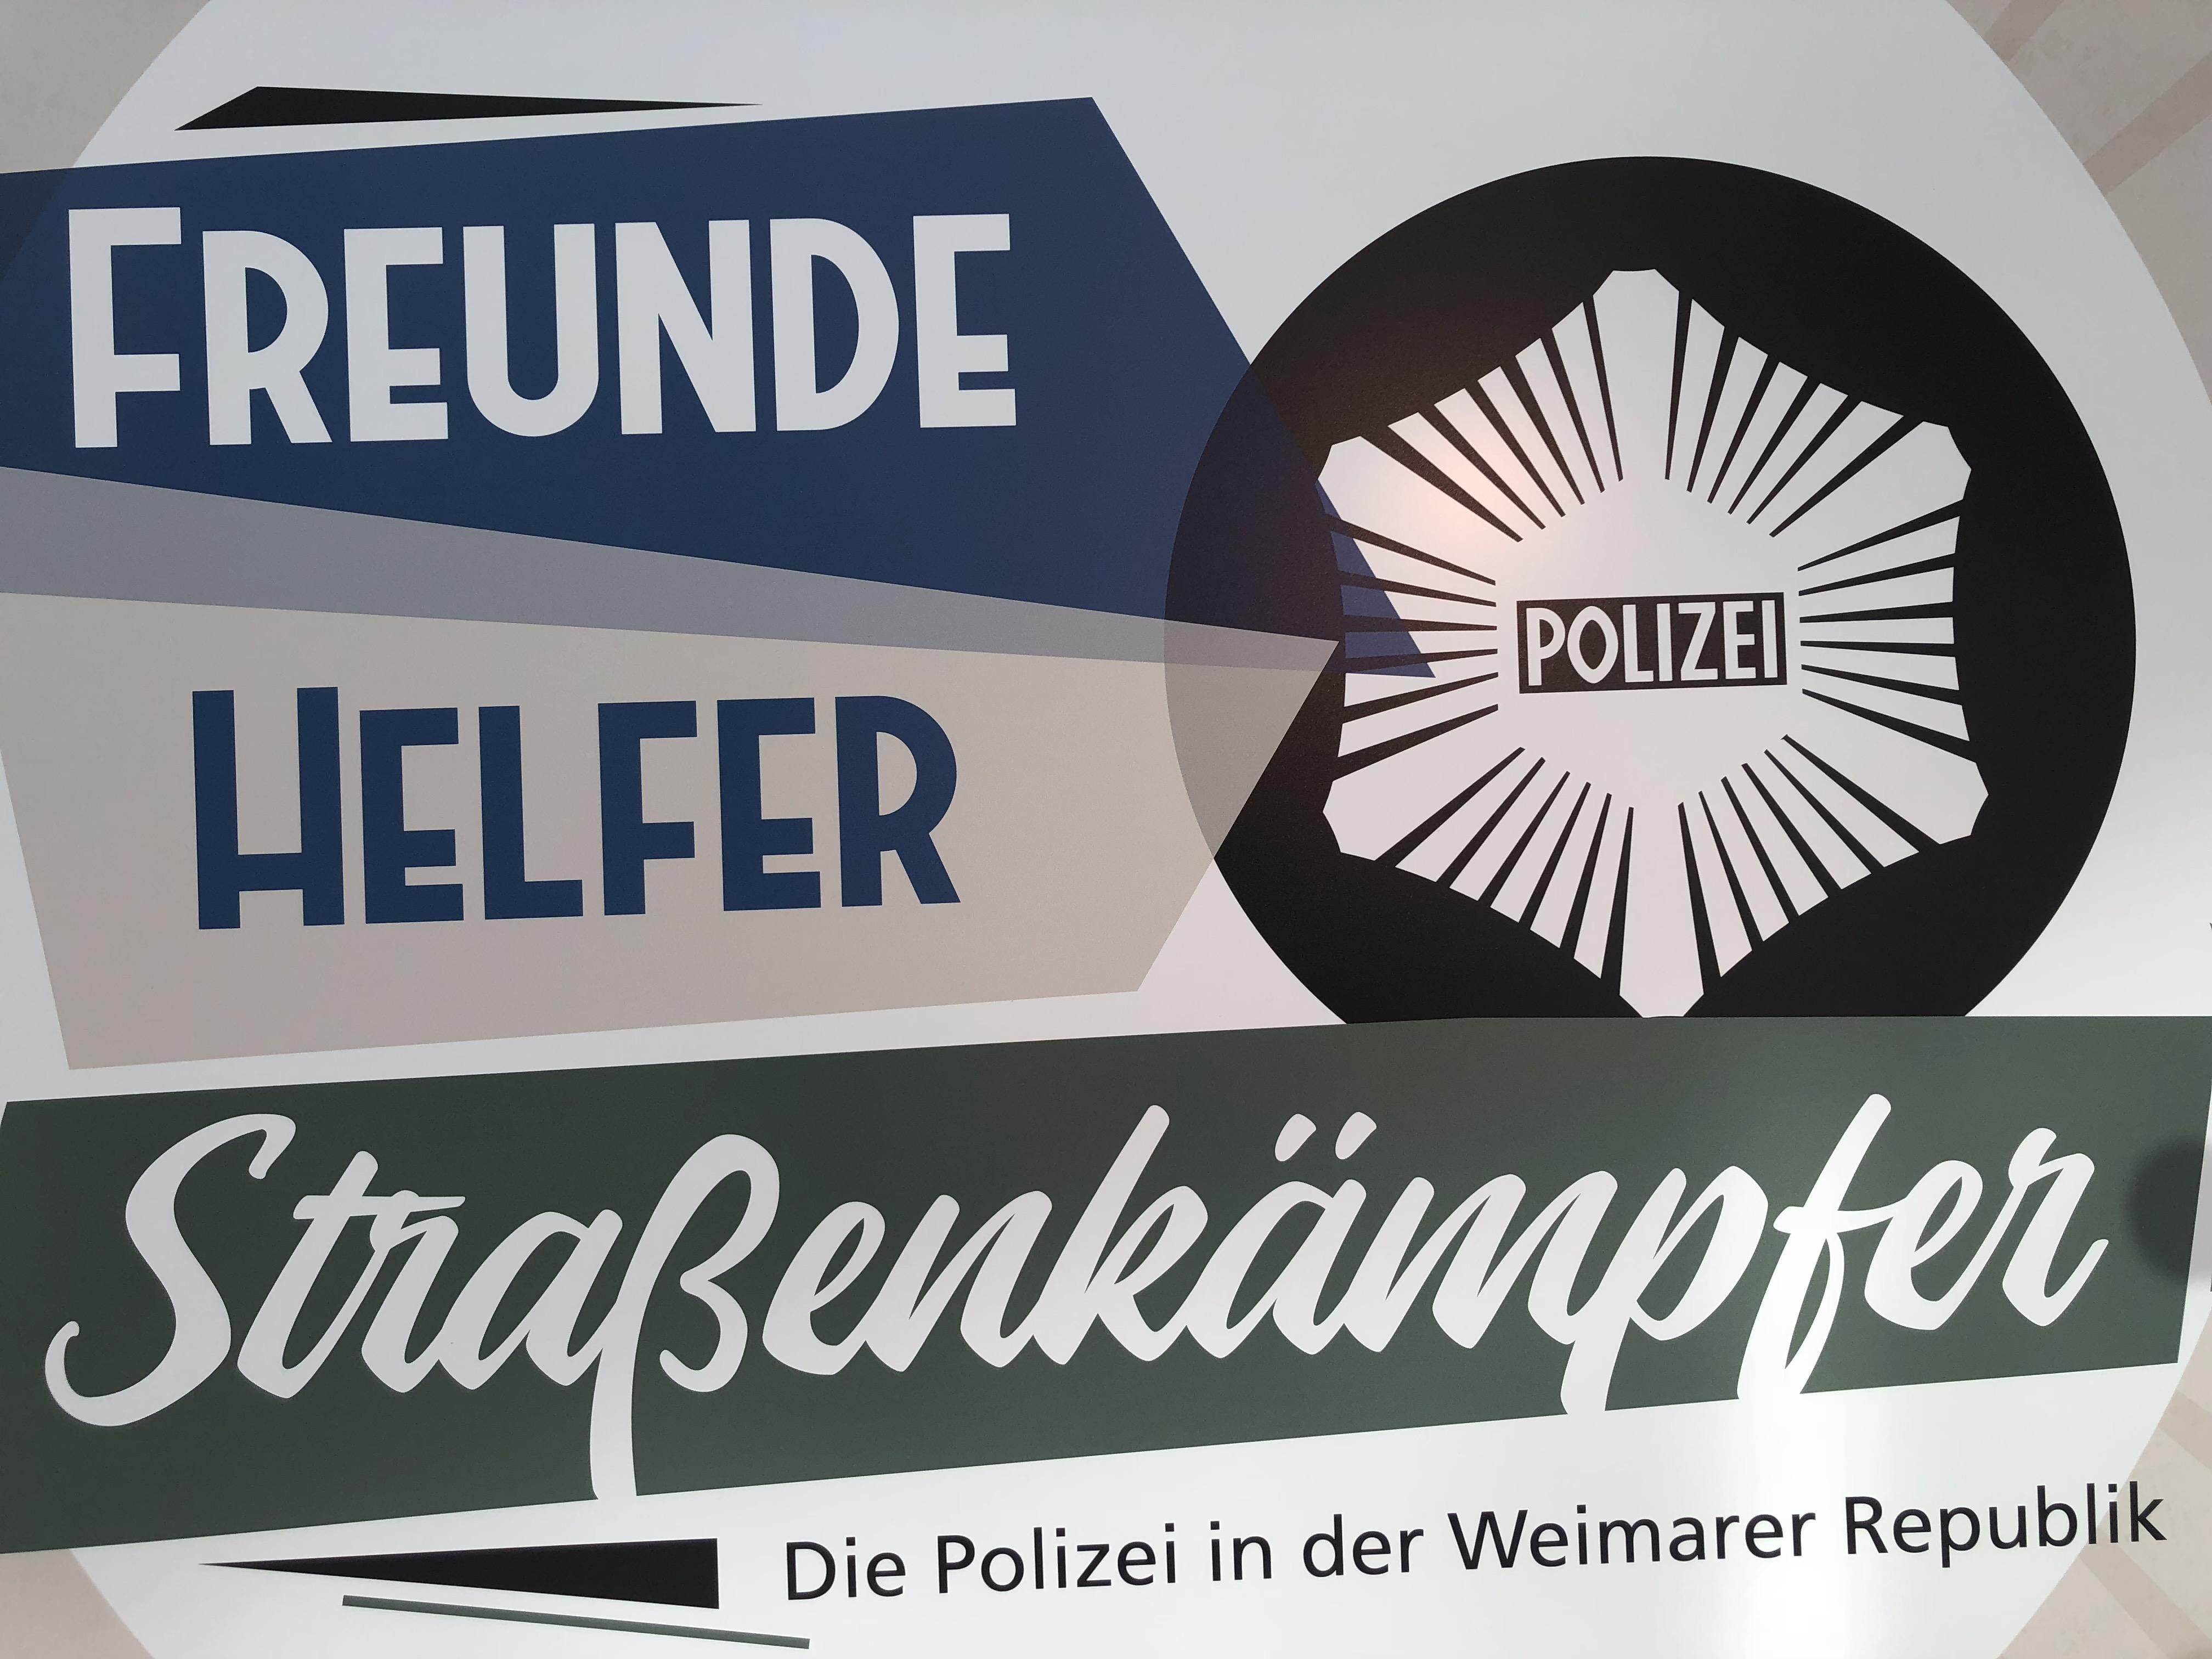 Titel Weimarer Republik